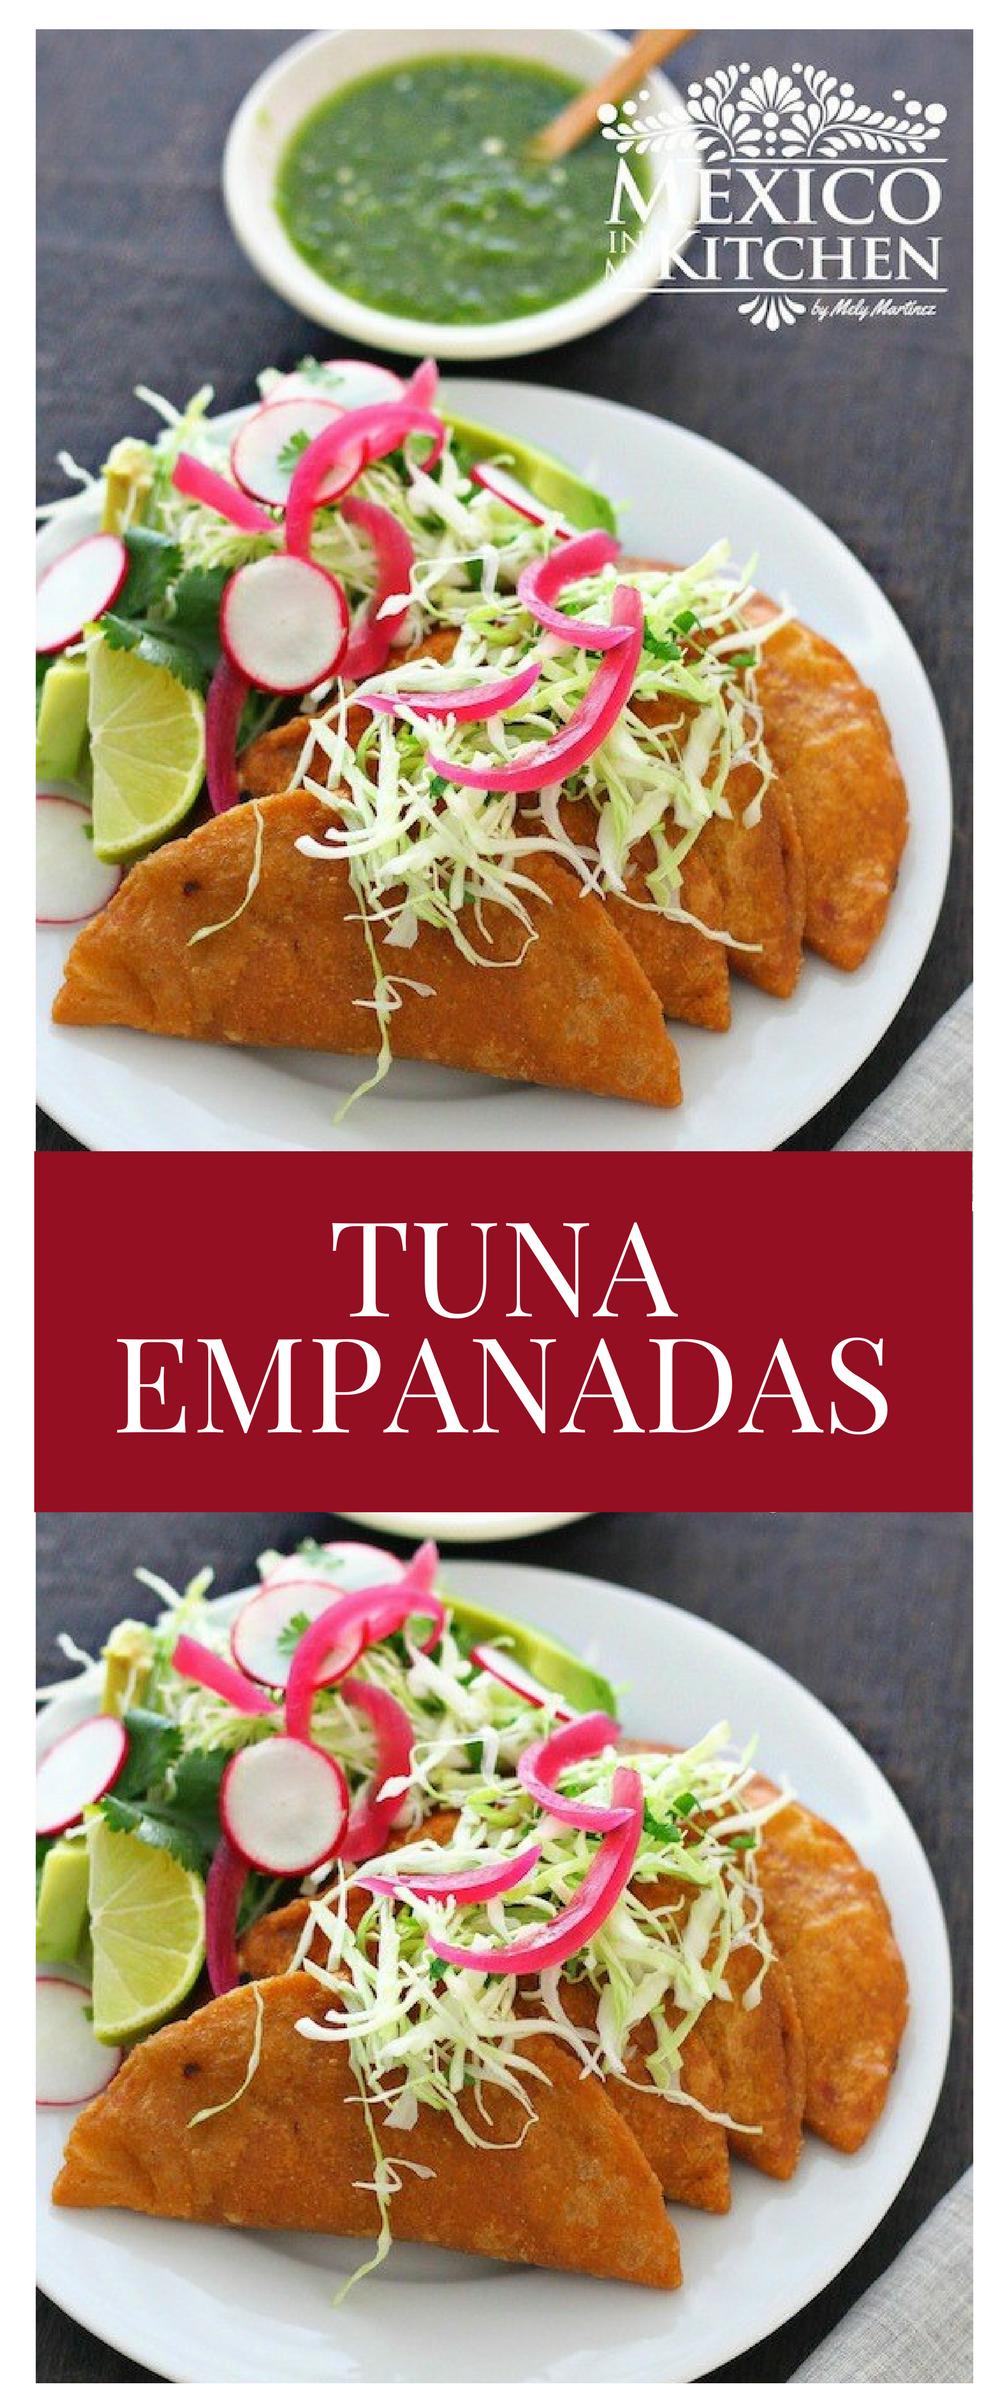 Tuna empanadas Recipe Mexican food recipes, Lent